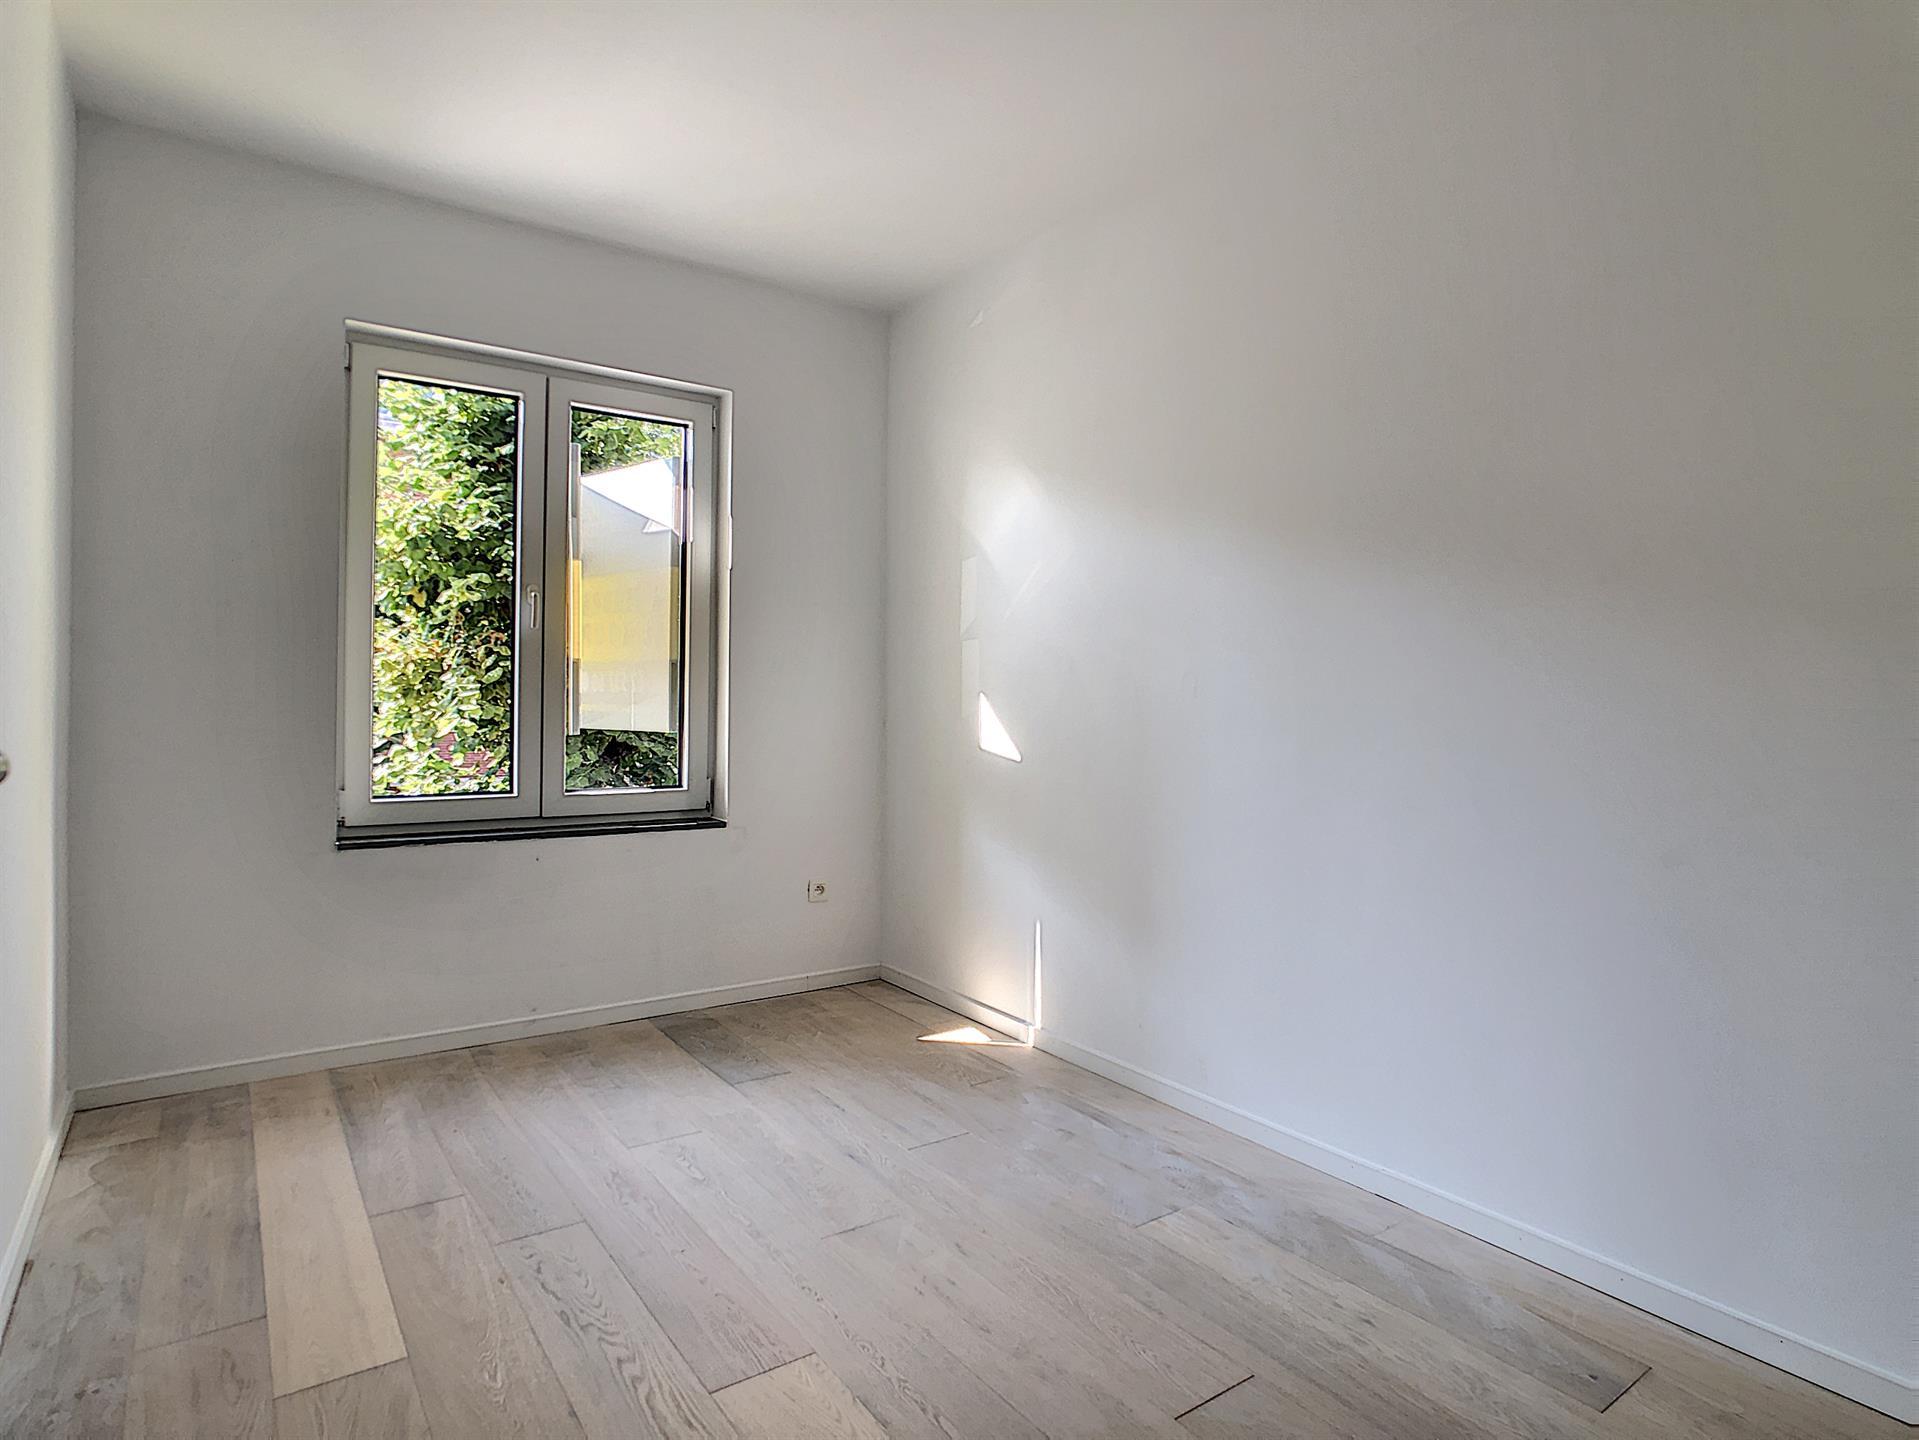 Appartement - Anderlecht - #4252385-11